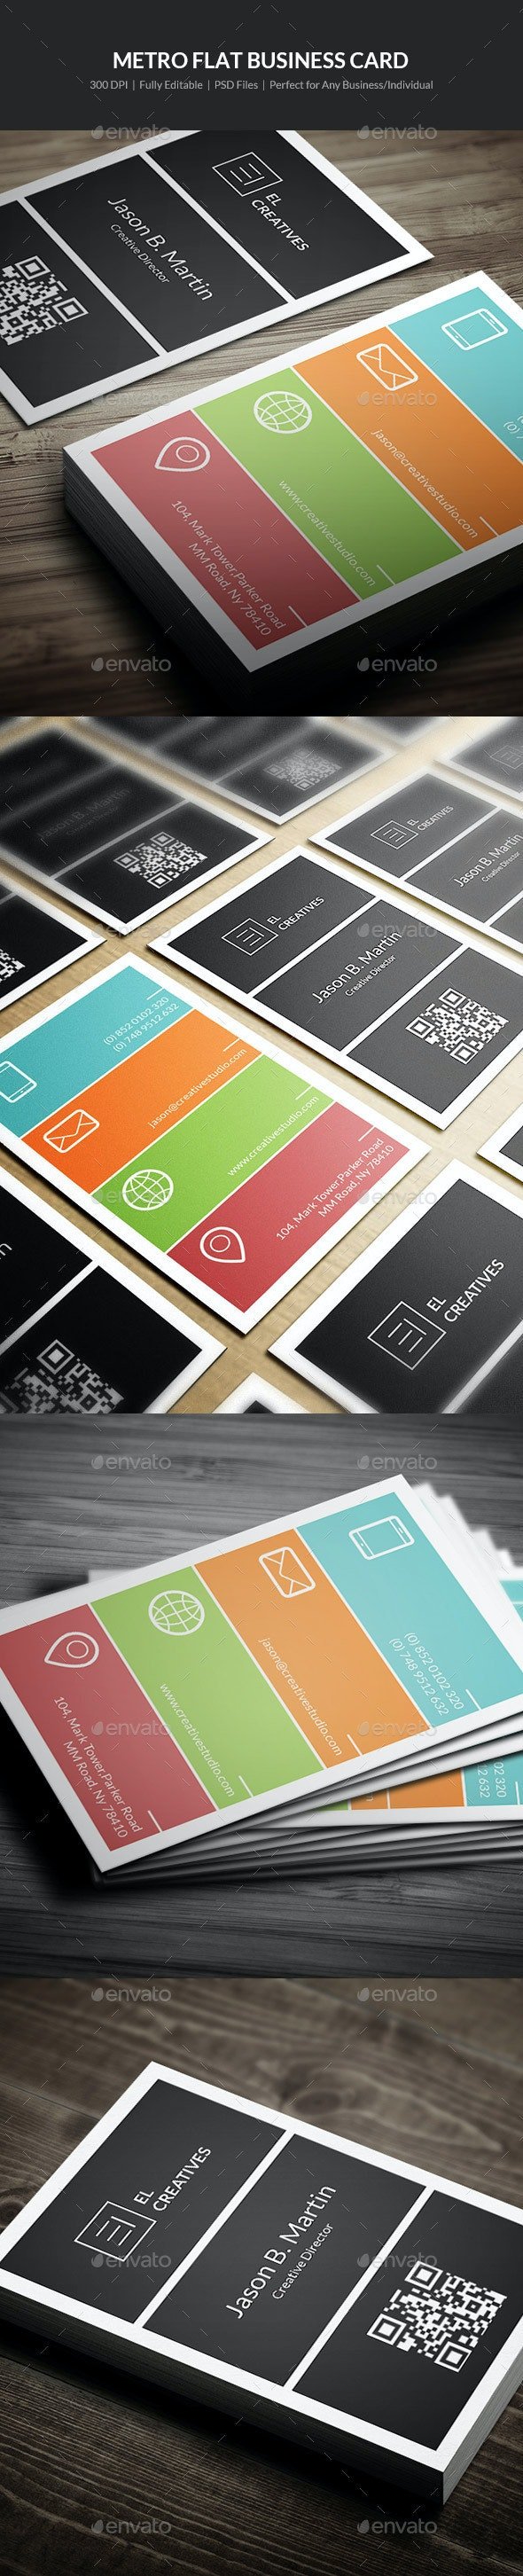 Metro Flat Business Card - 04 - Creative Business Cards